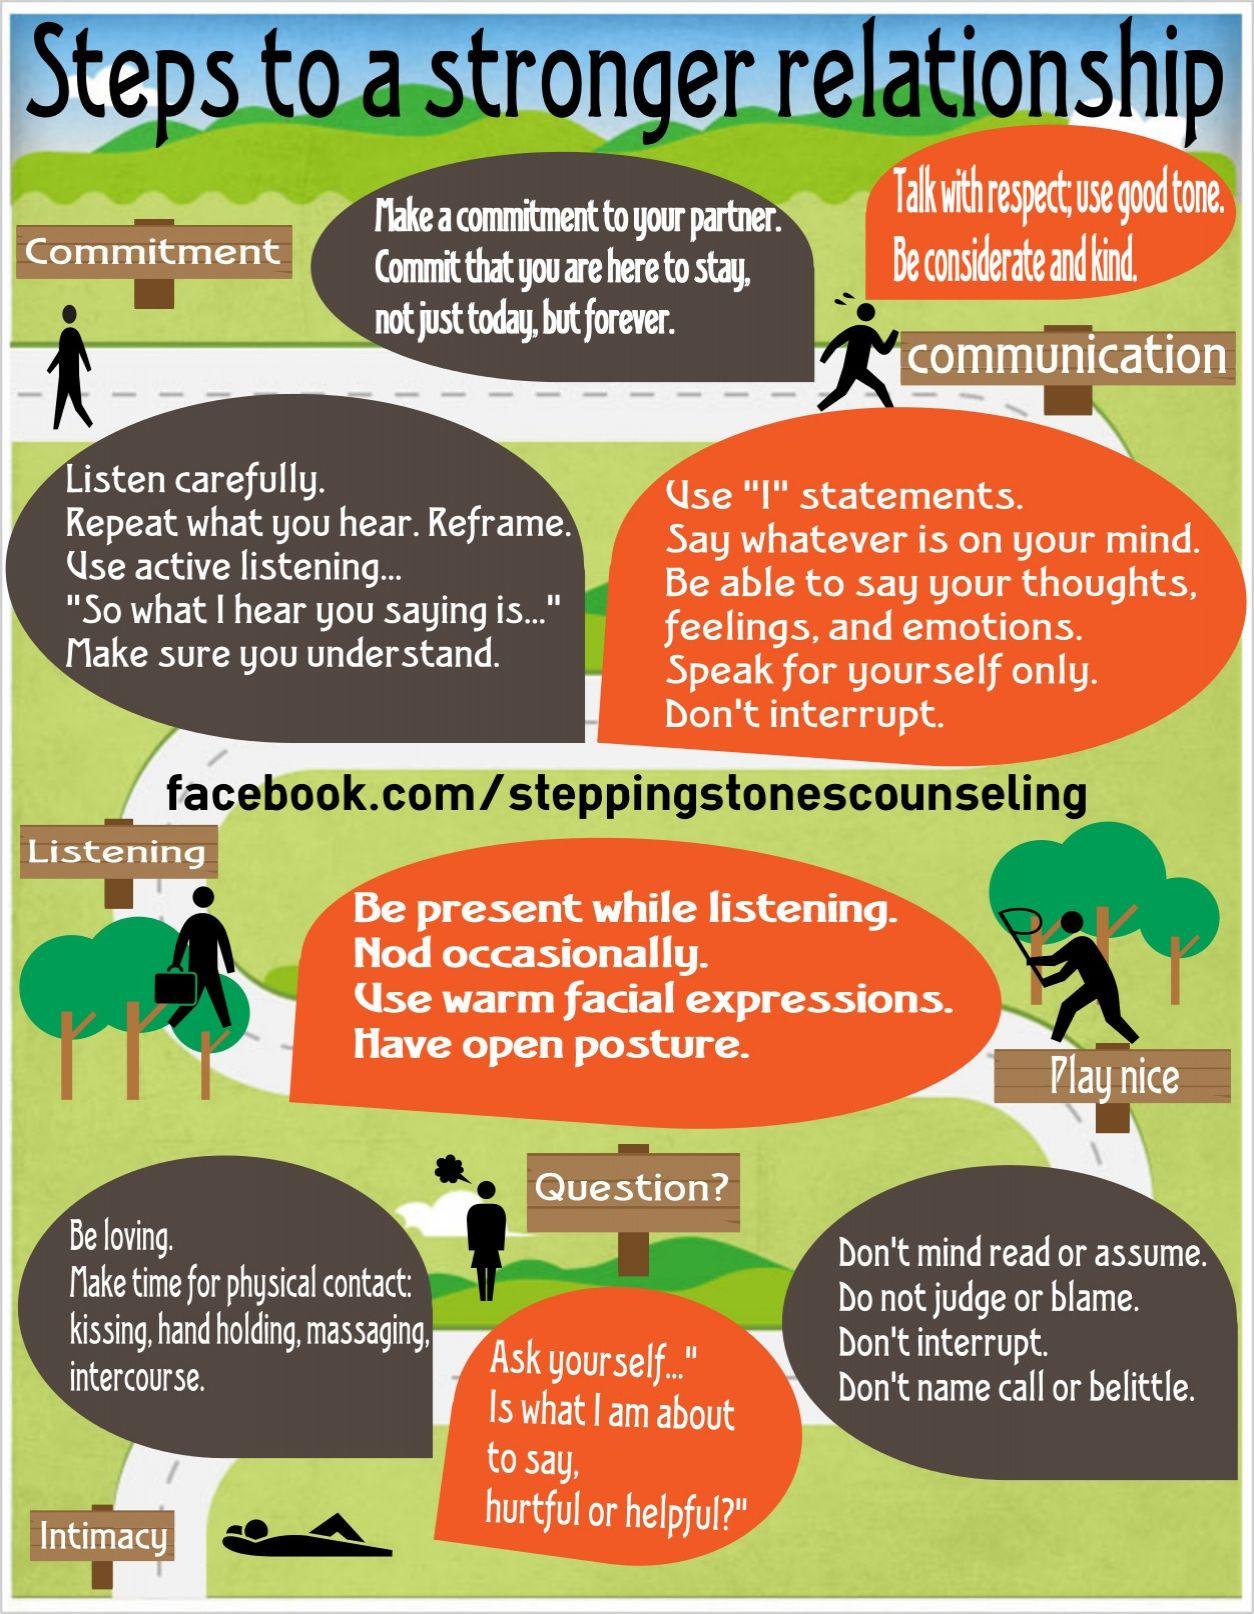 Steps To A Stronger Relationship Relationships Communication Facebook